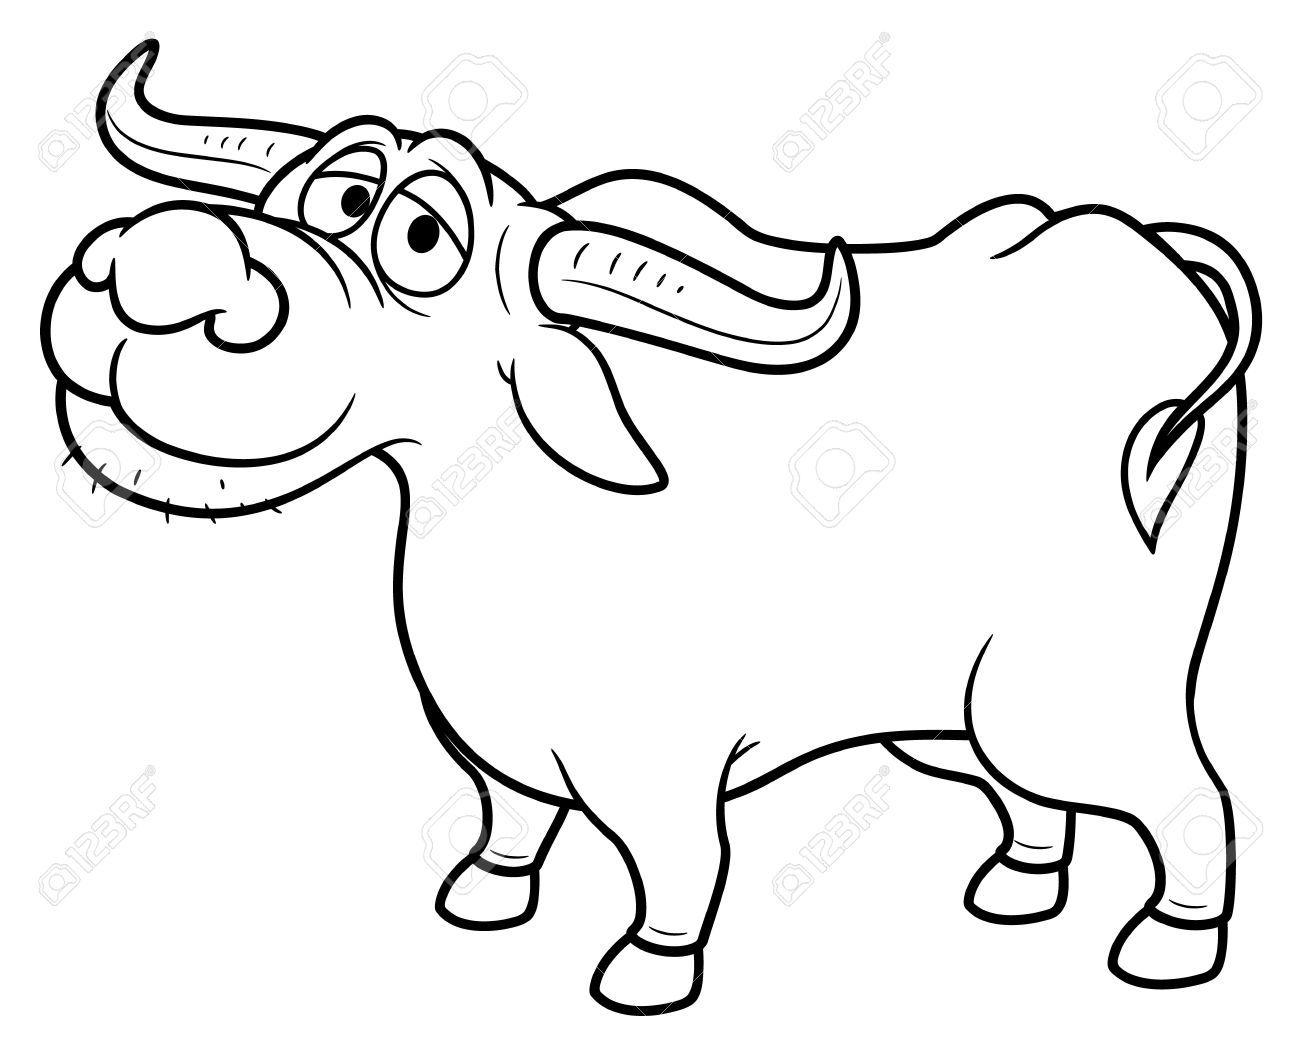 Buffalo black and white clipart 6 » Clipart Portal.